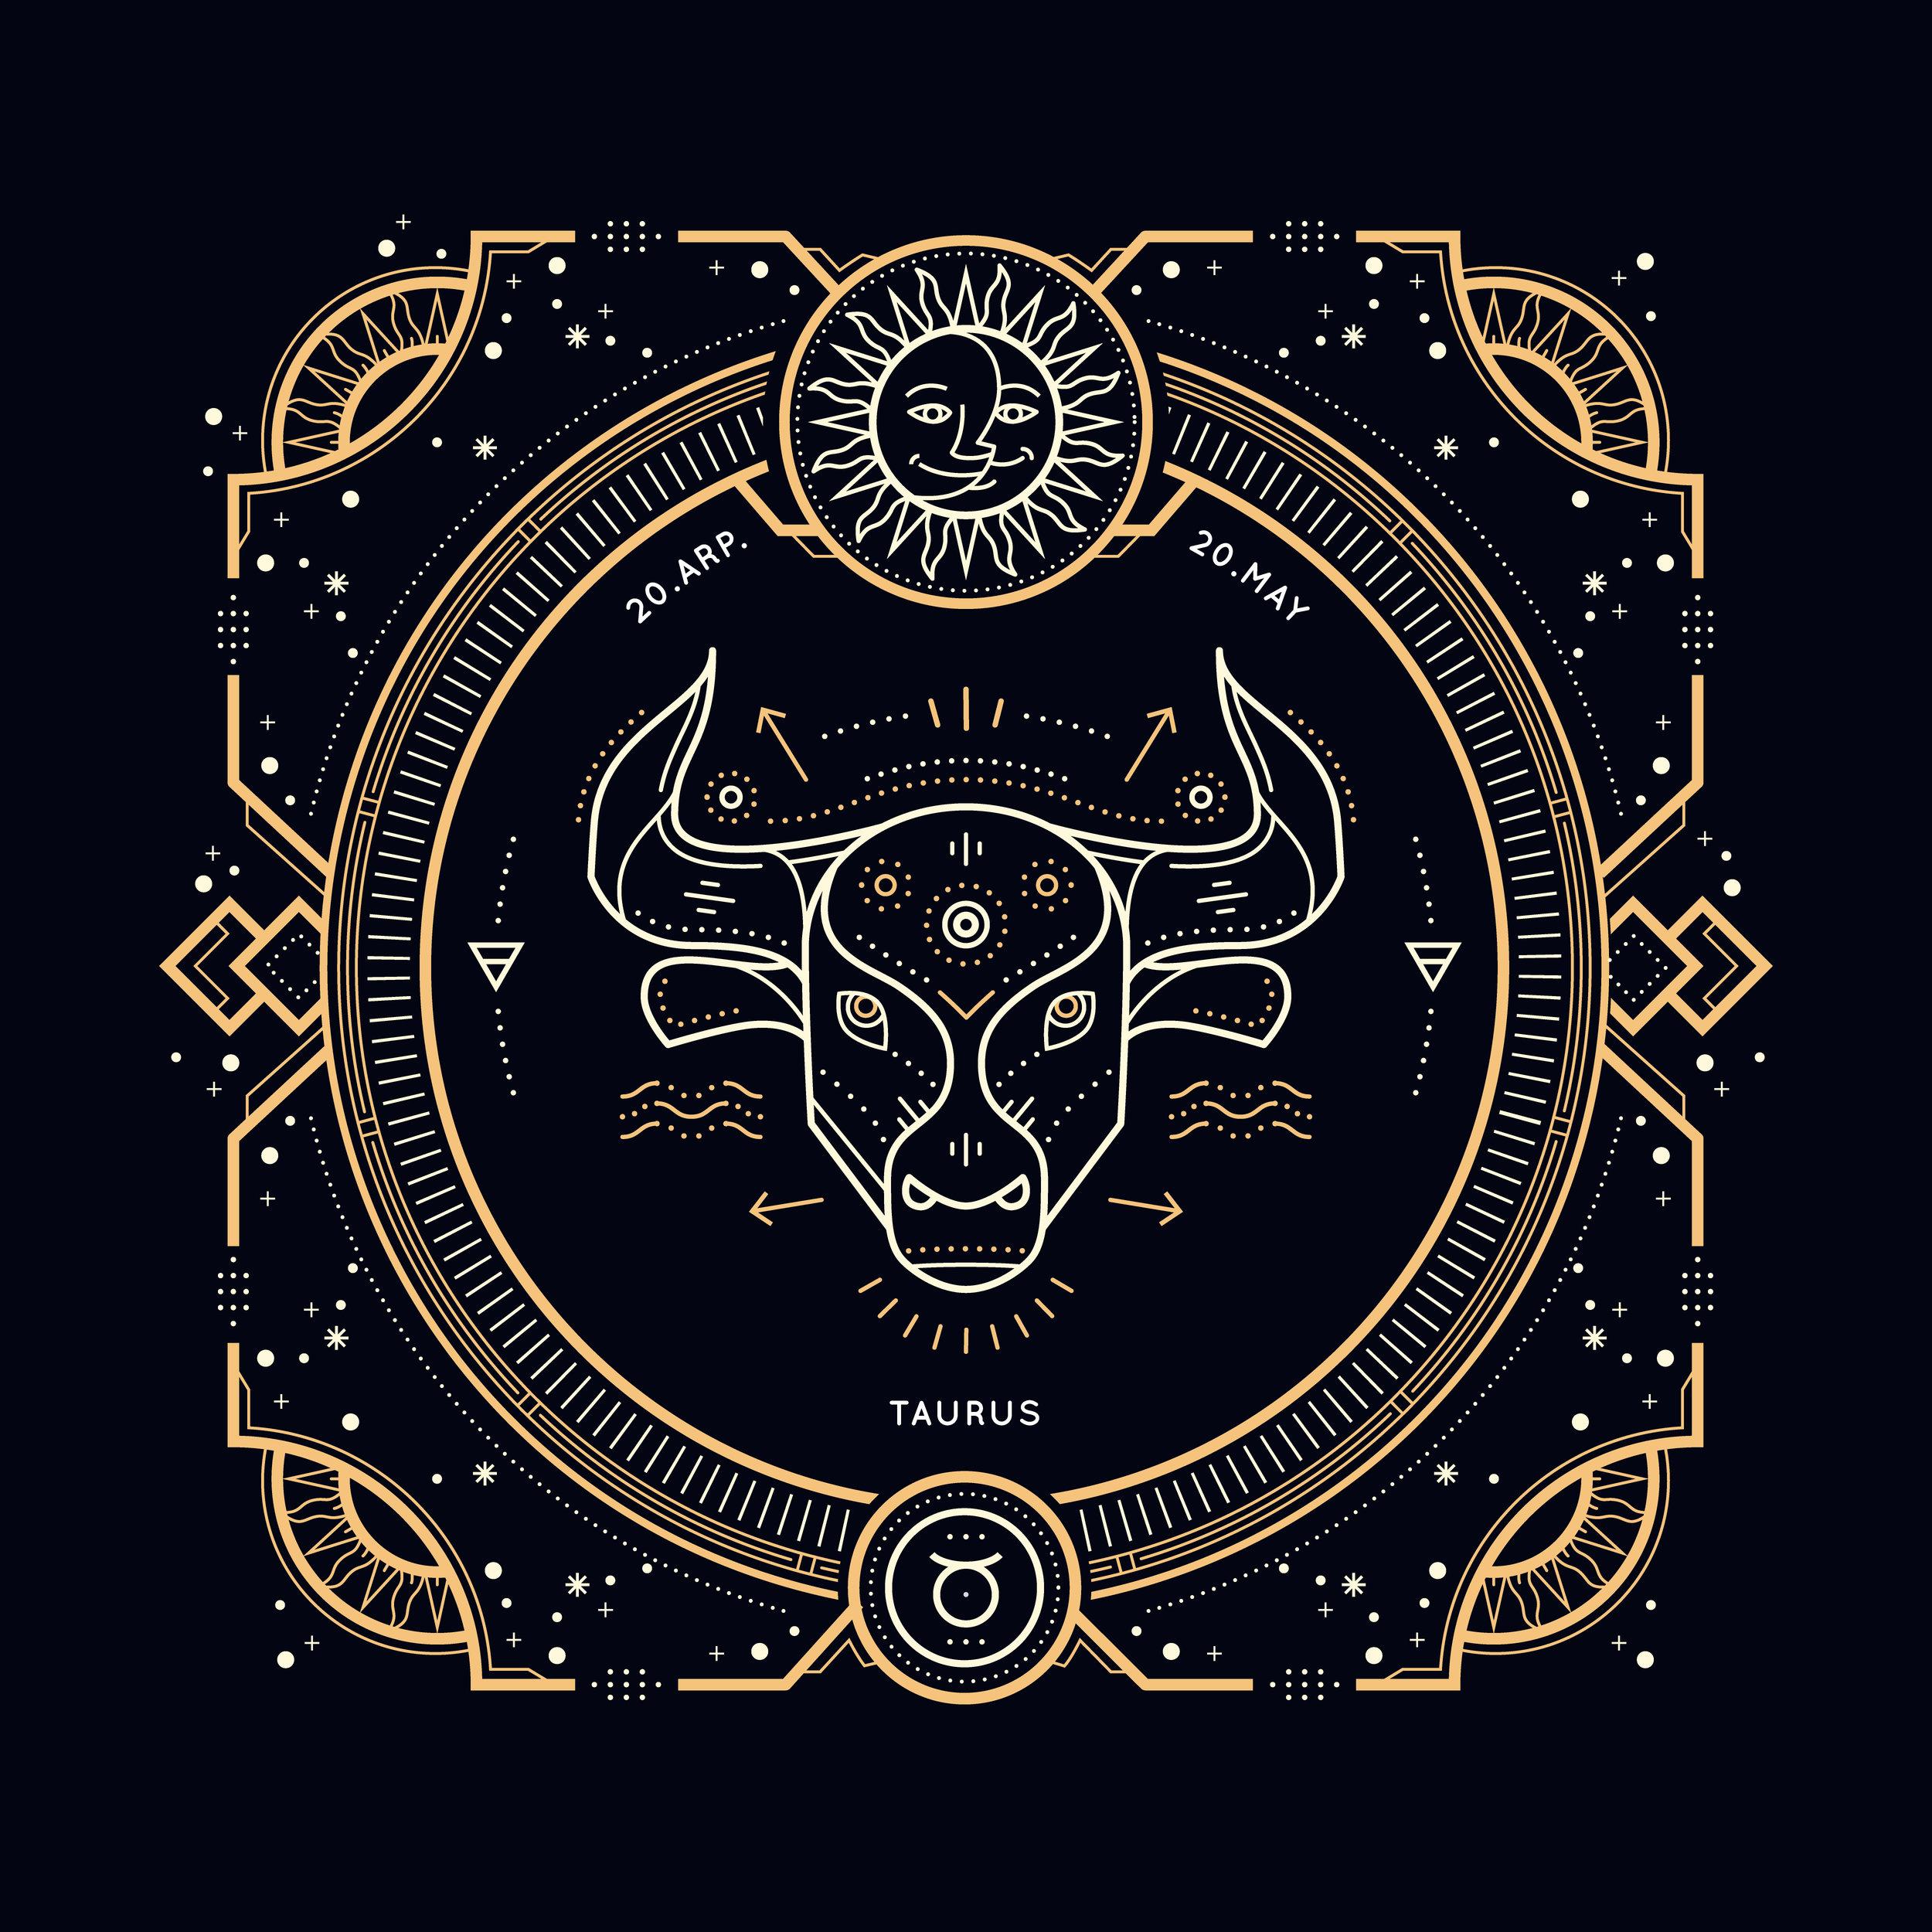 Zodiac-signs-black-gold_Taurus.jpg